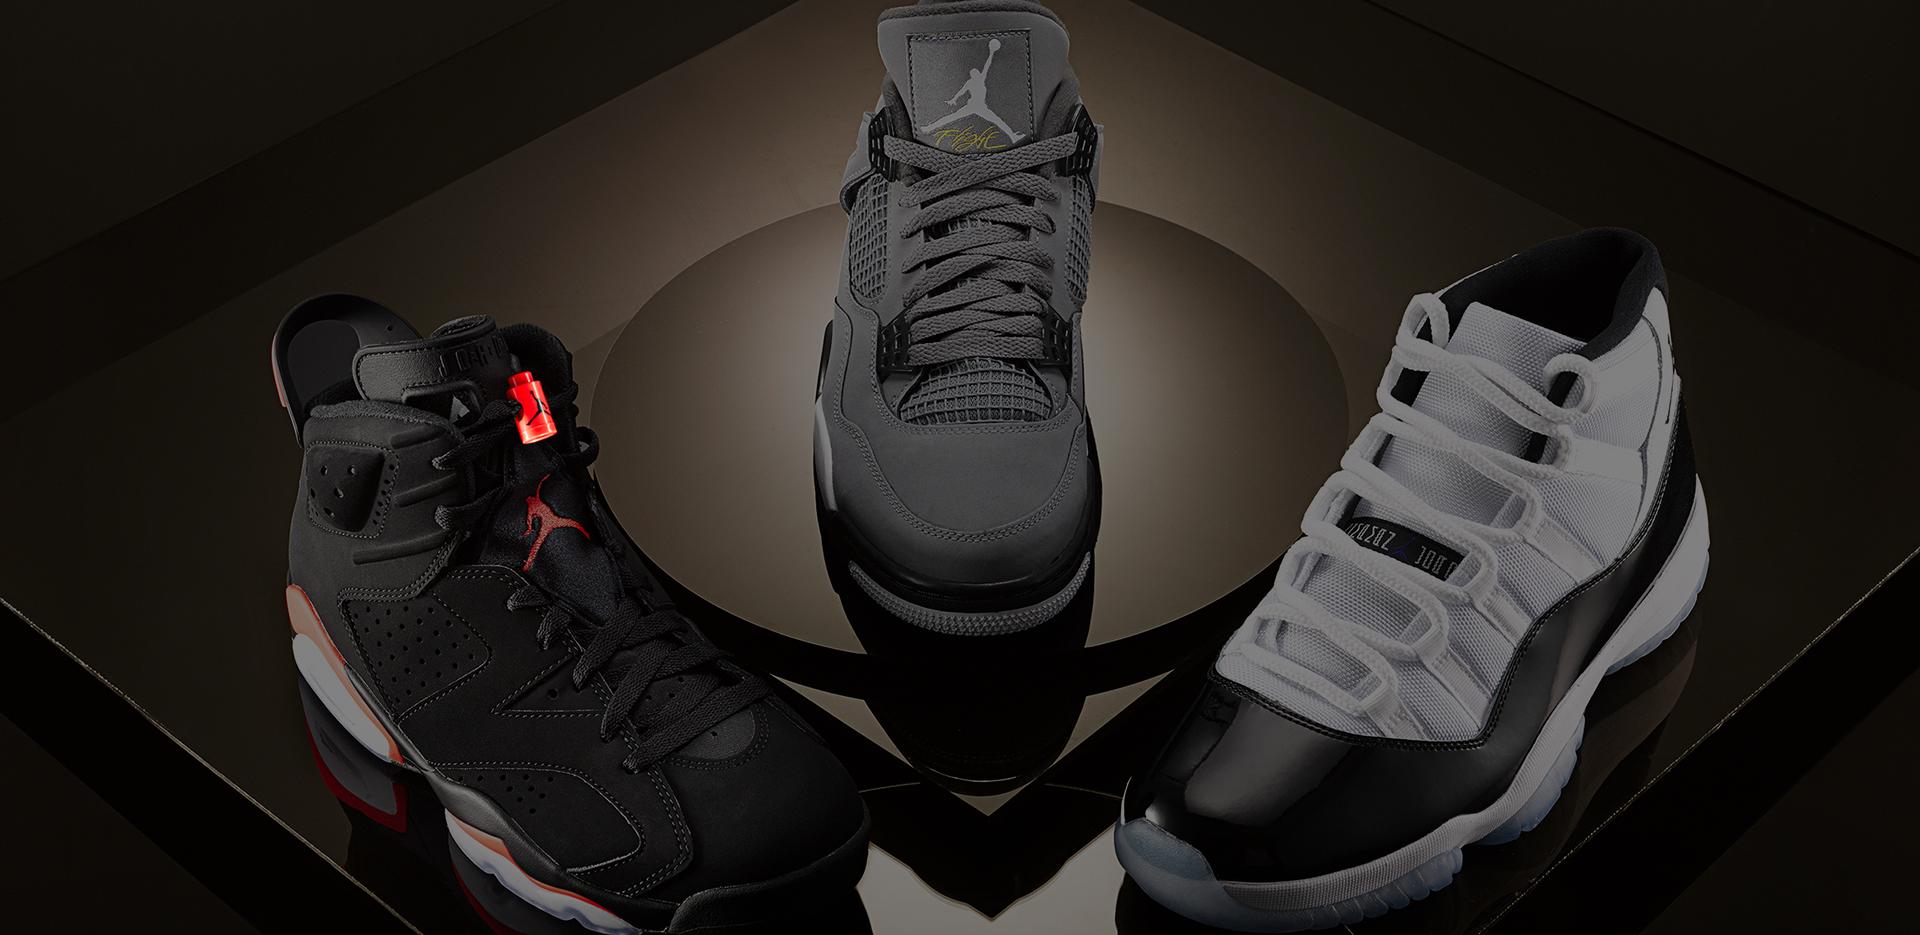 The Definitive AIR JORDAN ESSENTIALS Shopping Guide - SneakerNews.com